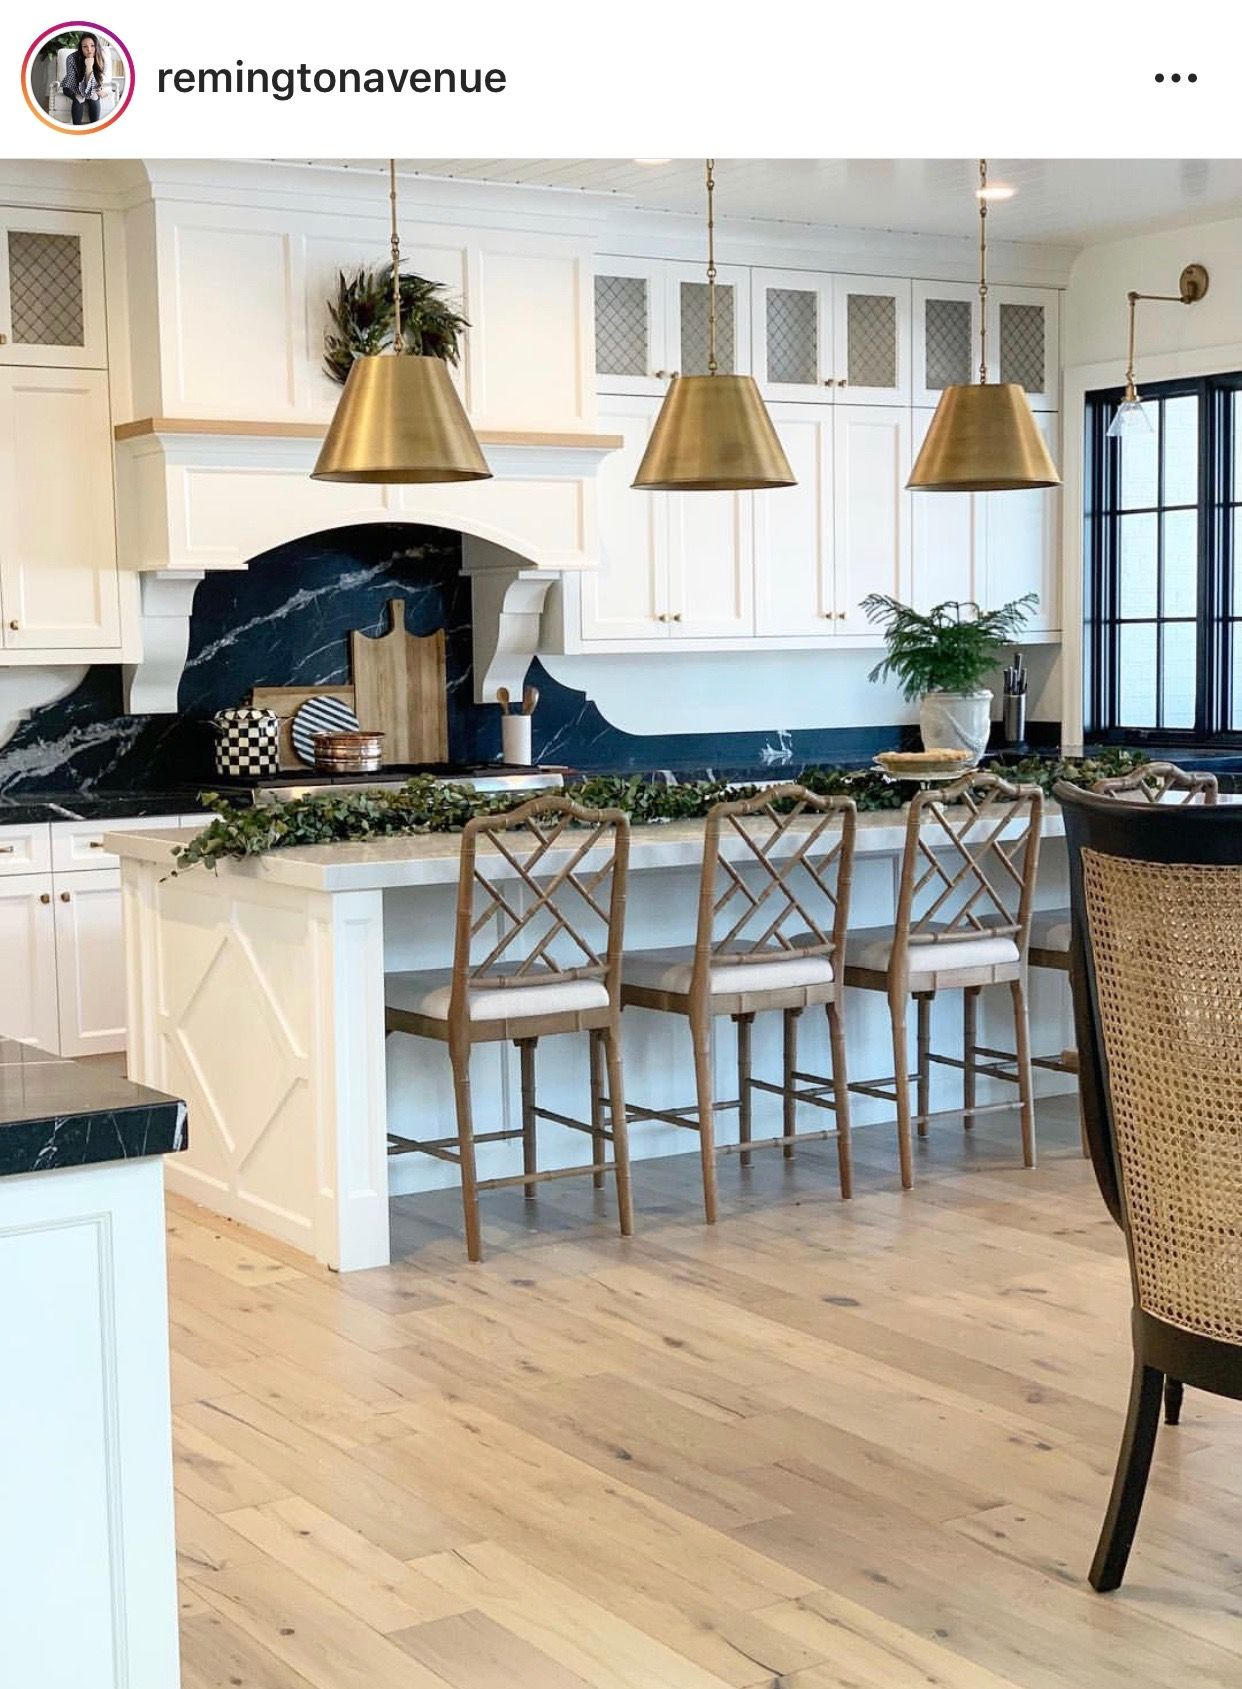 Pin by Michael Kaser on Interior: Kitchen | Pallet ideas ...